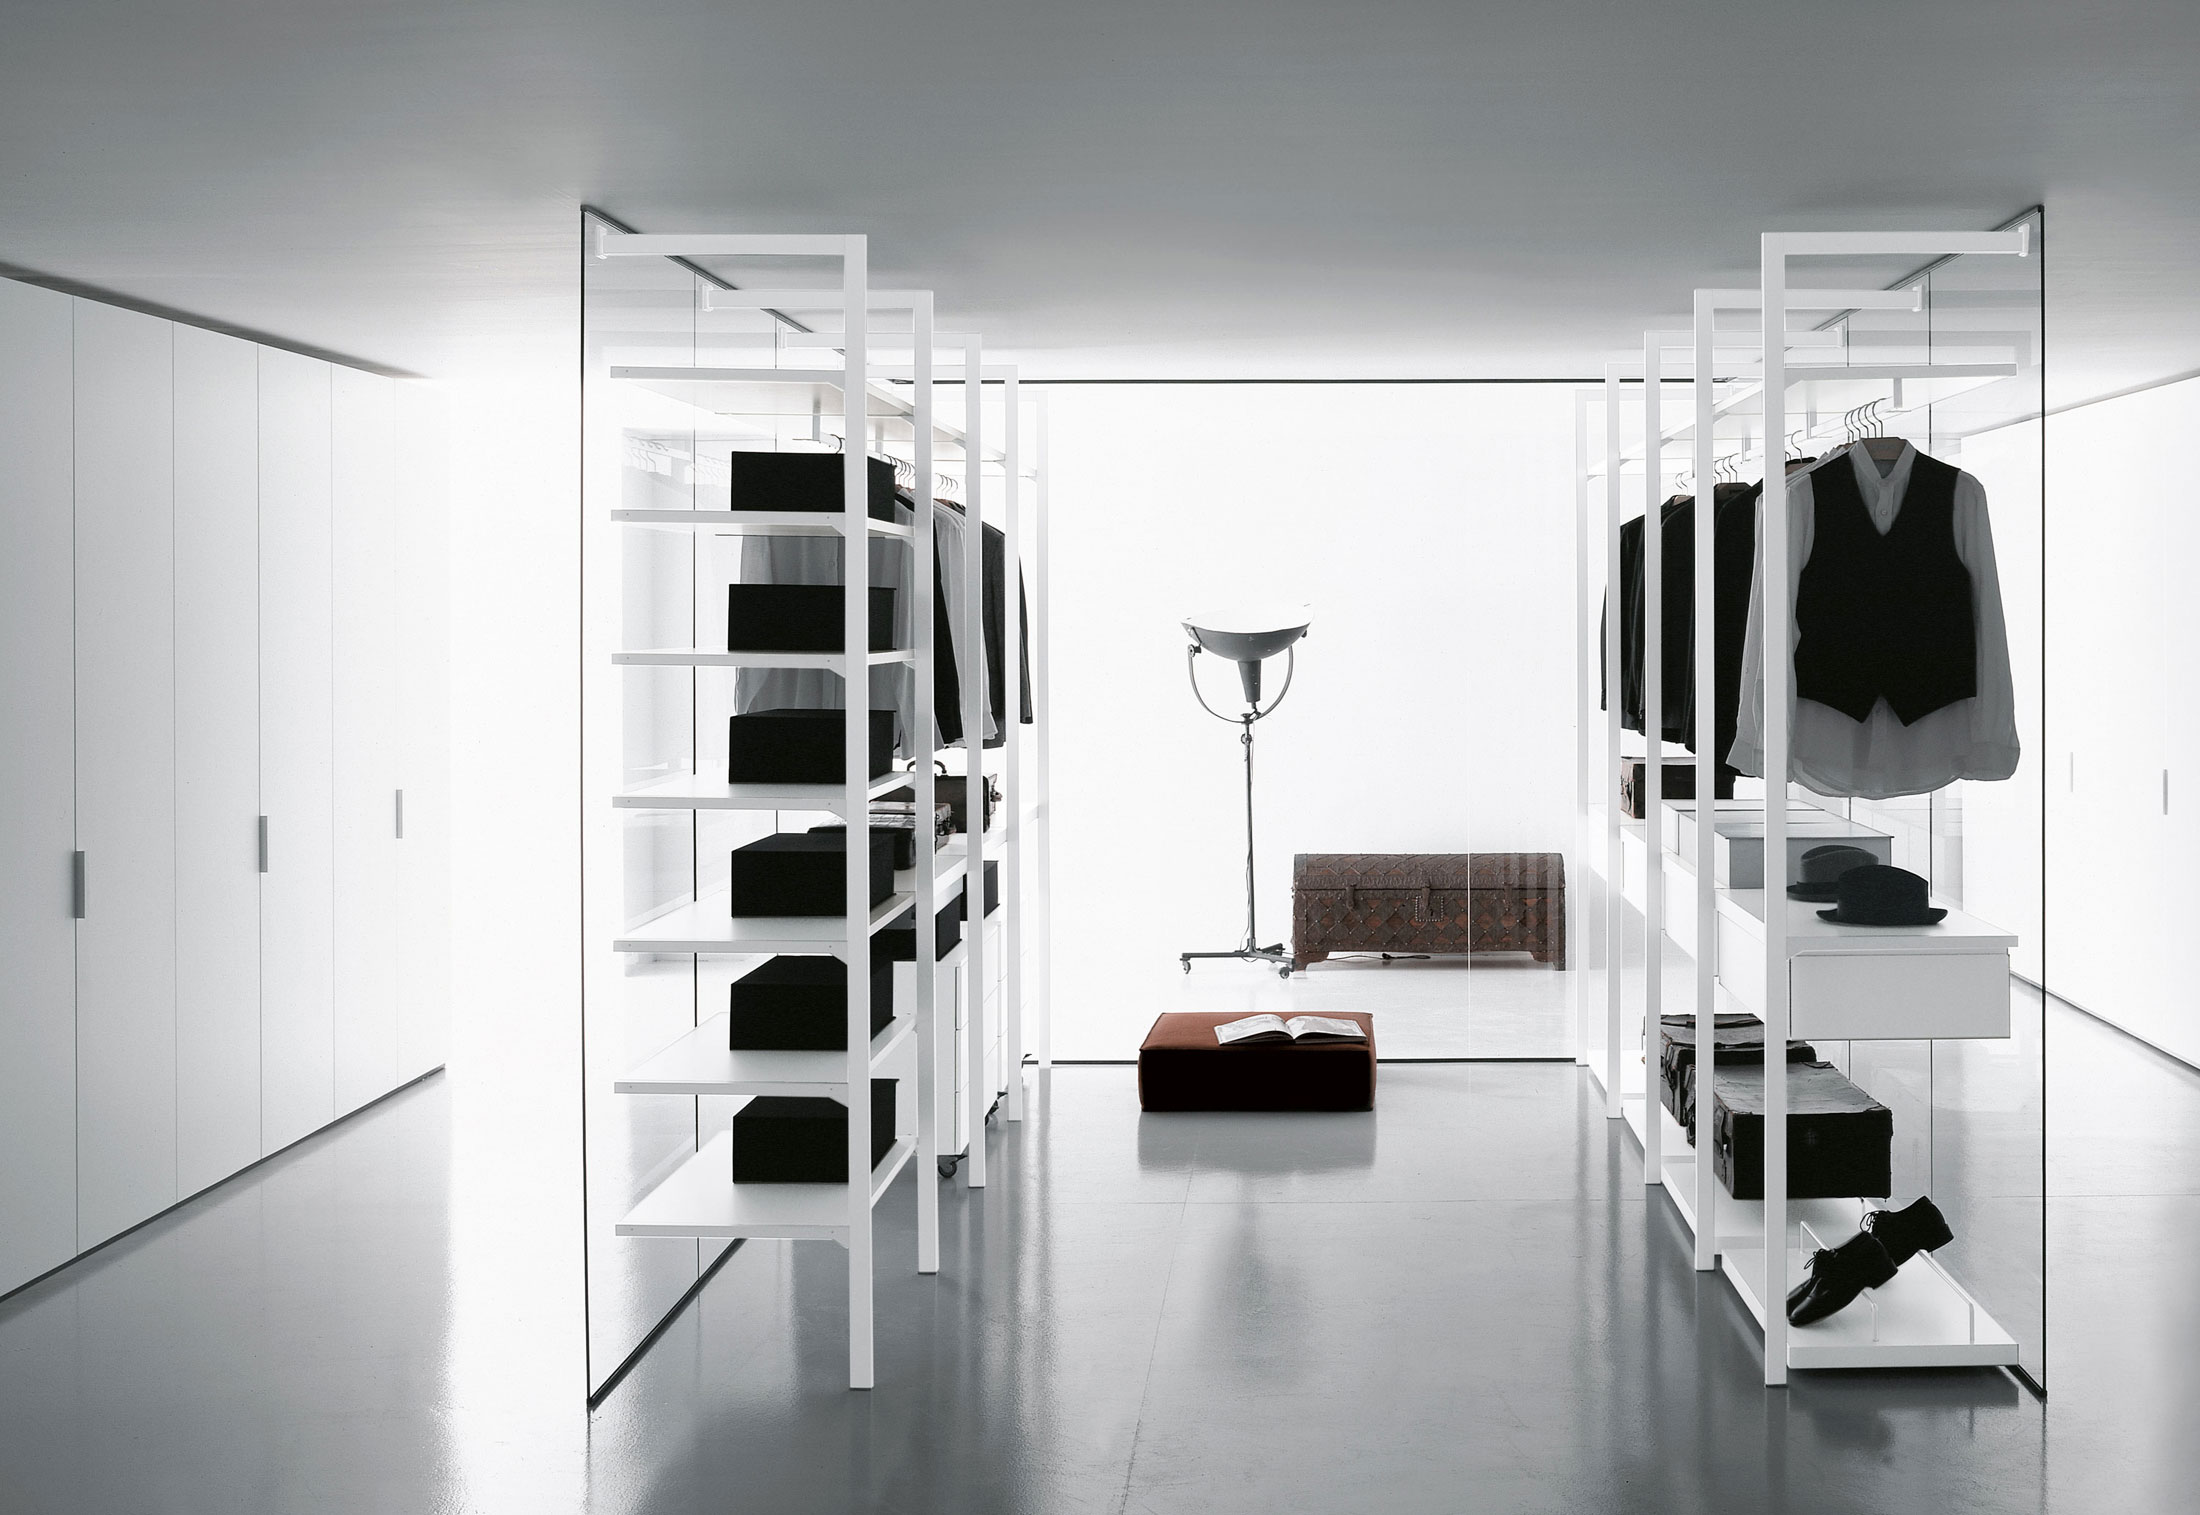 Cabina Armadio English : Storage cabina armadio walk in closet by porro stylepark